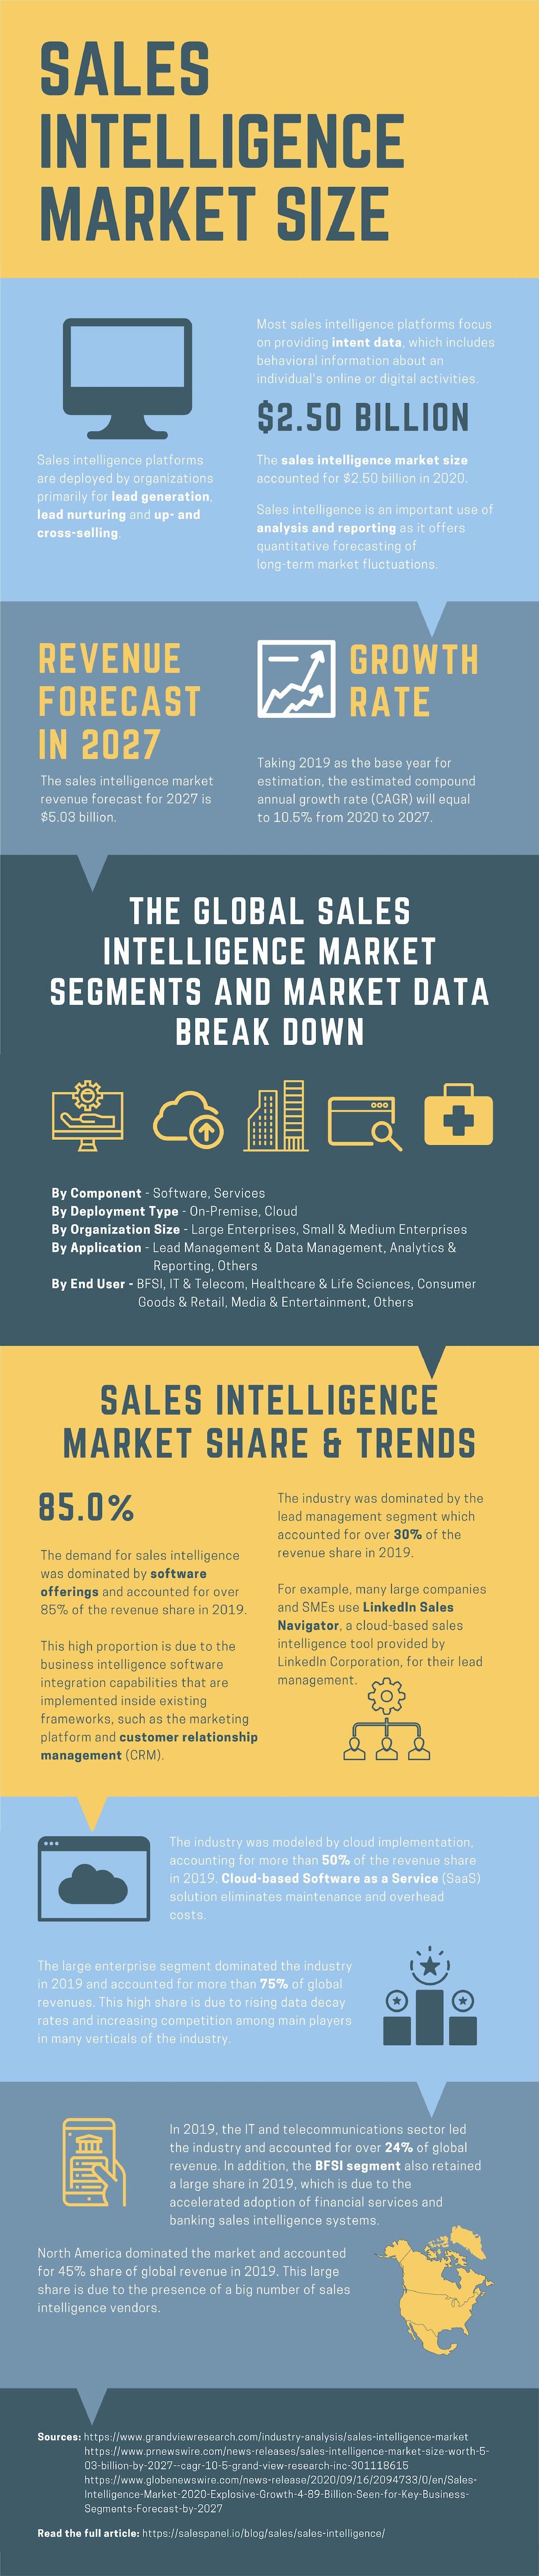 Sales Intelligence Infographic